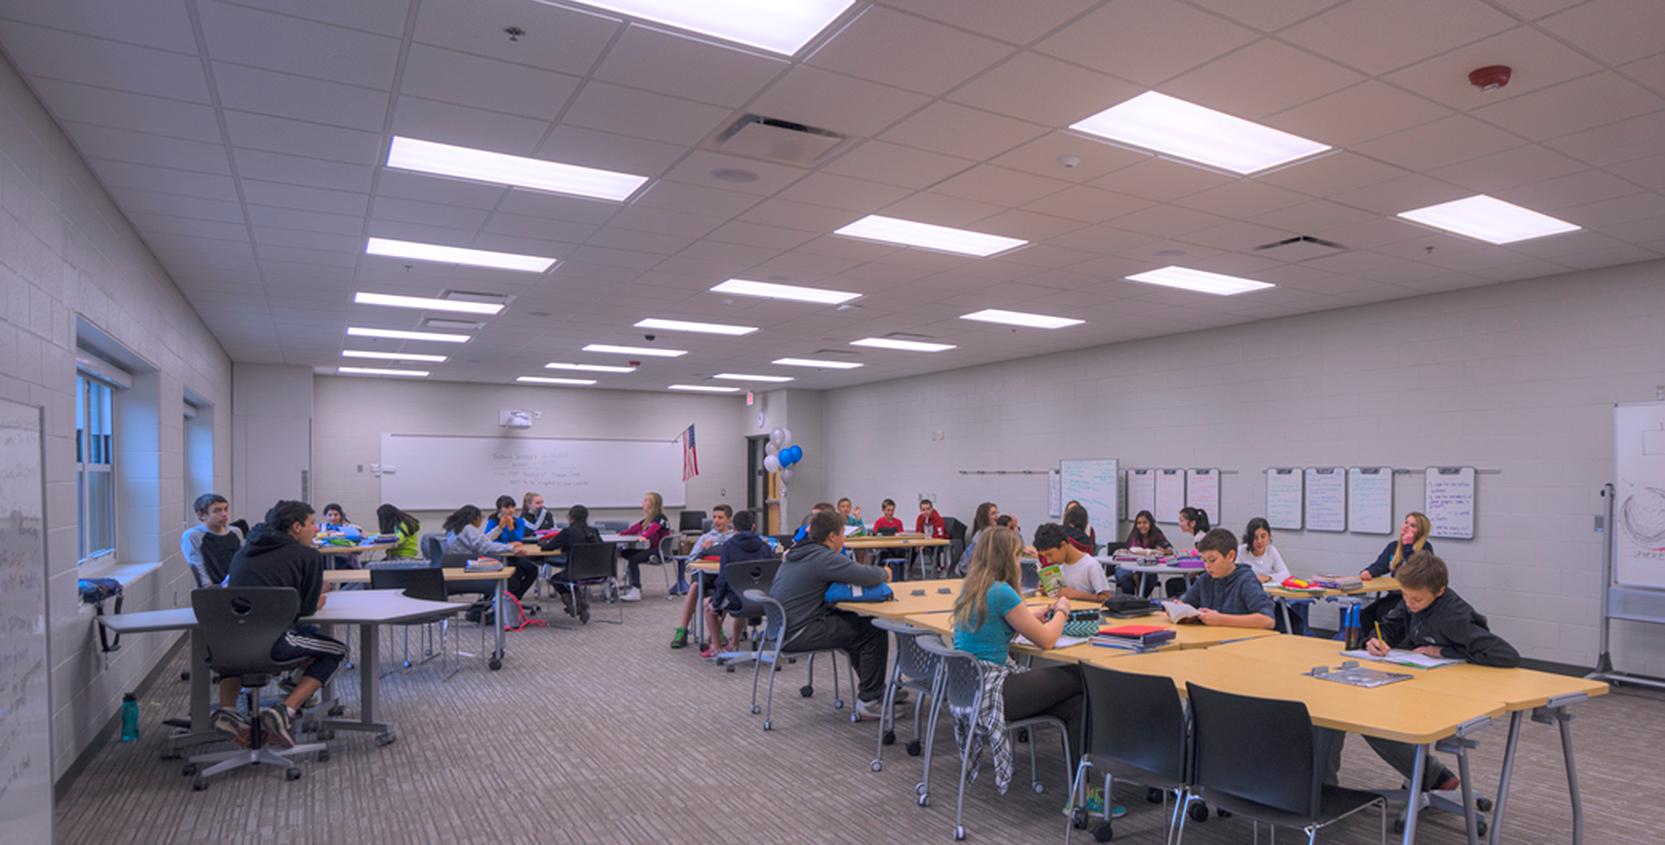 PCCS-Liberty-Middle-School-Classroom-2_1665x845